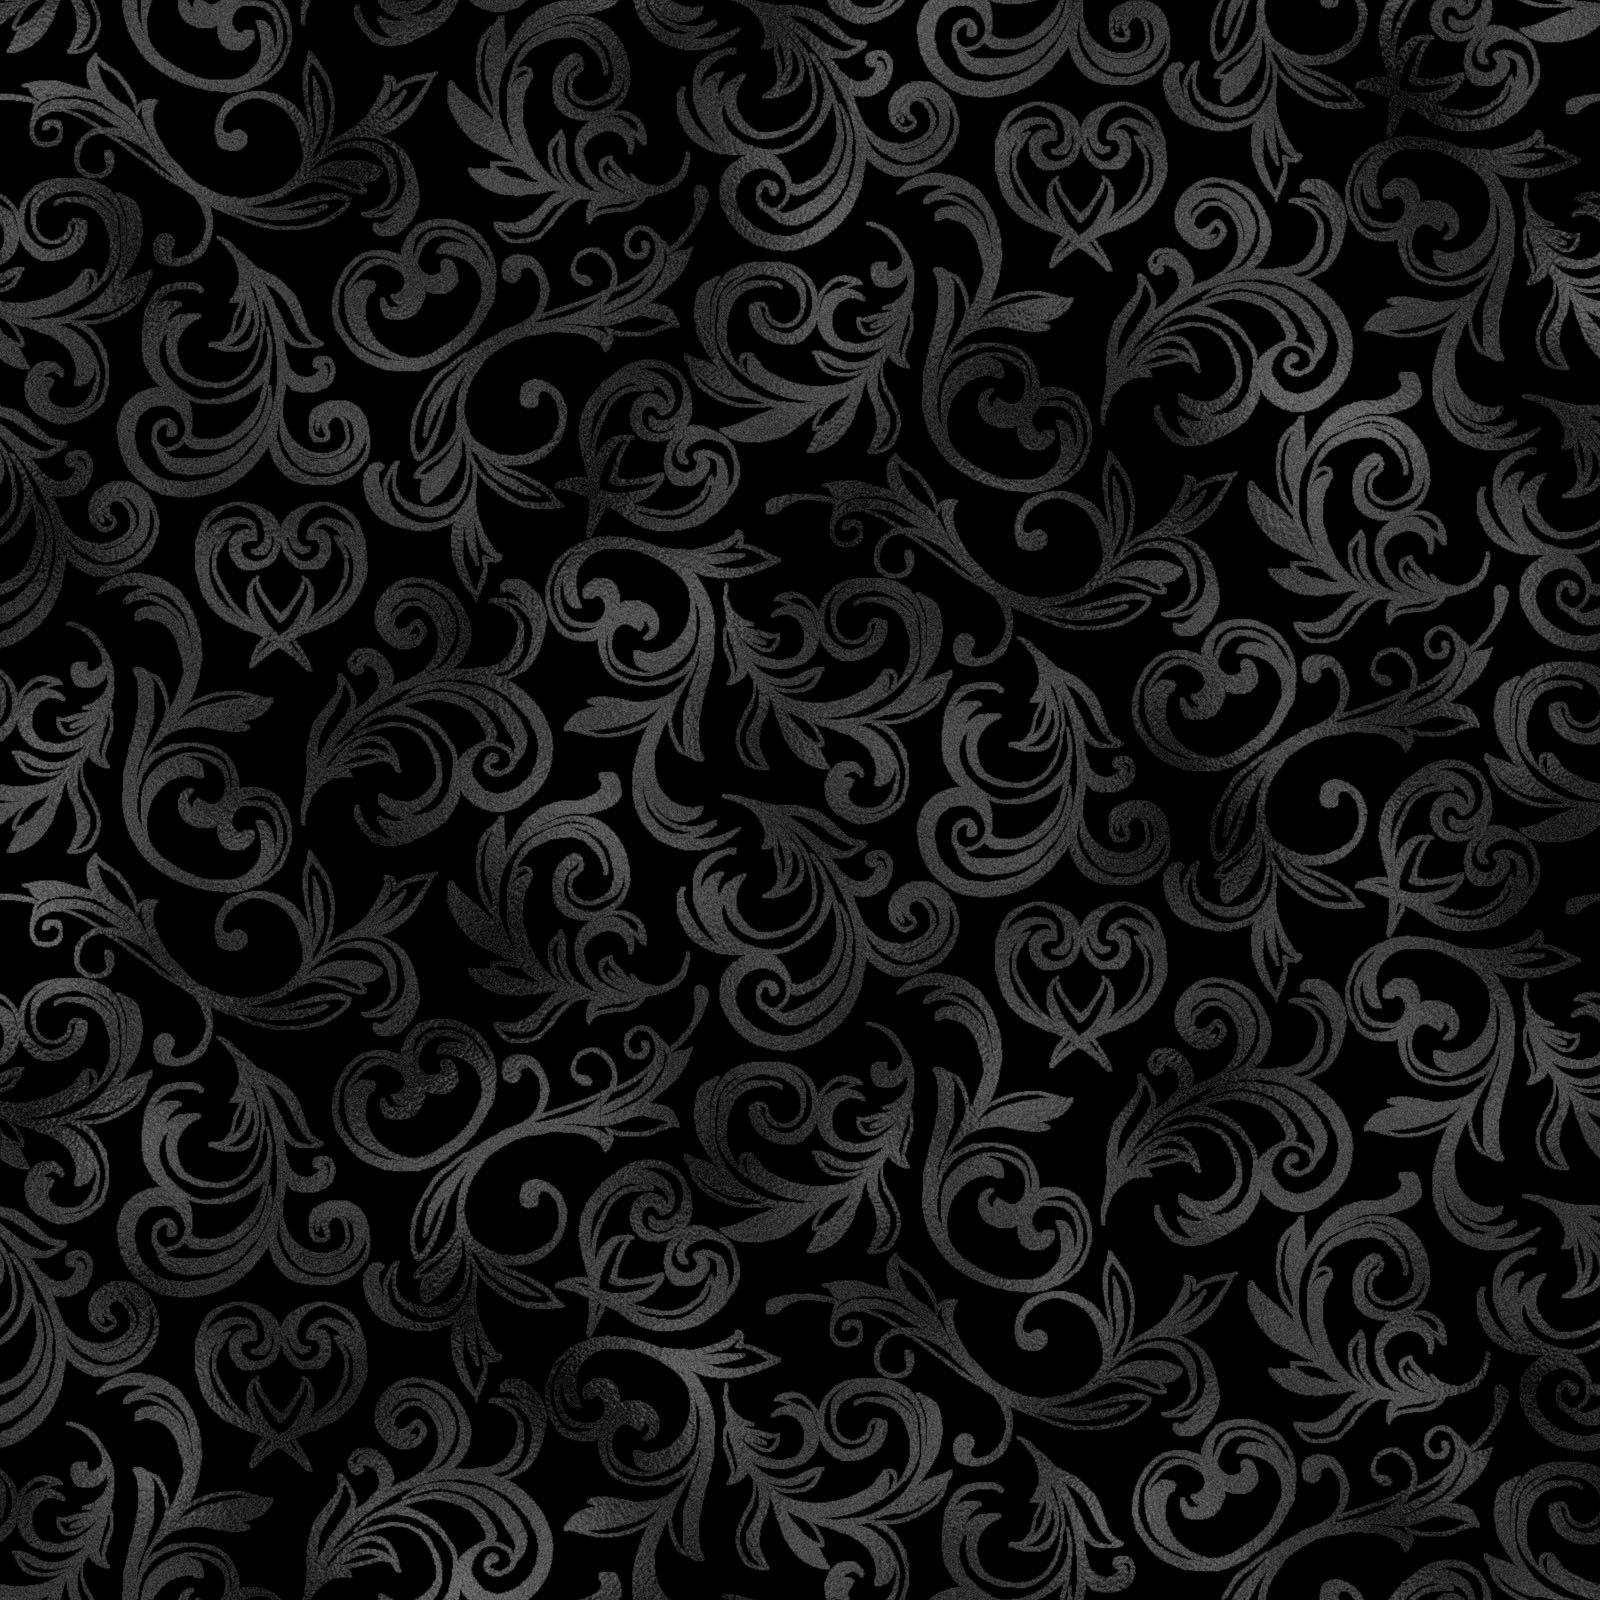 Pearl Essence Scroll Black<br/>Maywood Studio 114-J